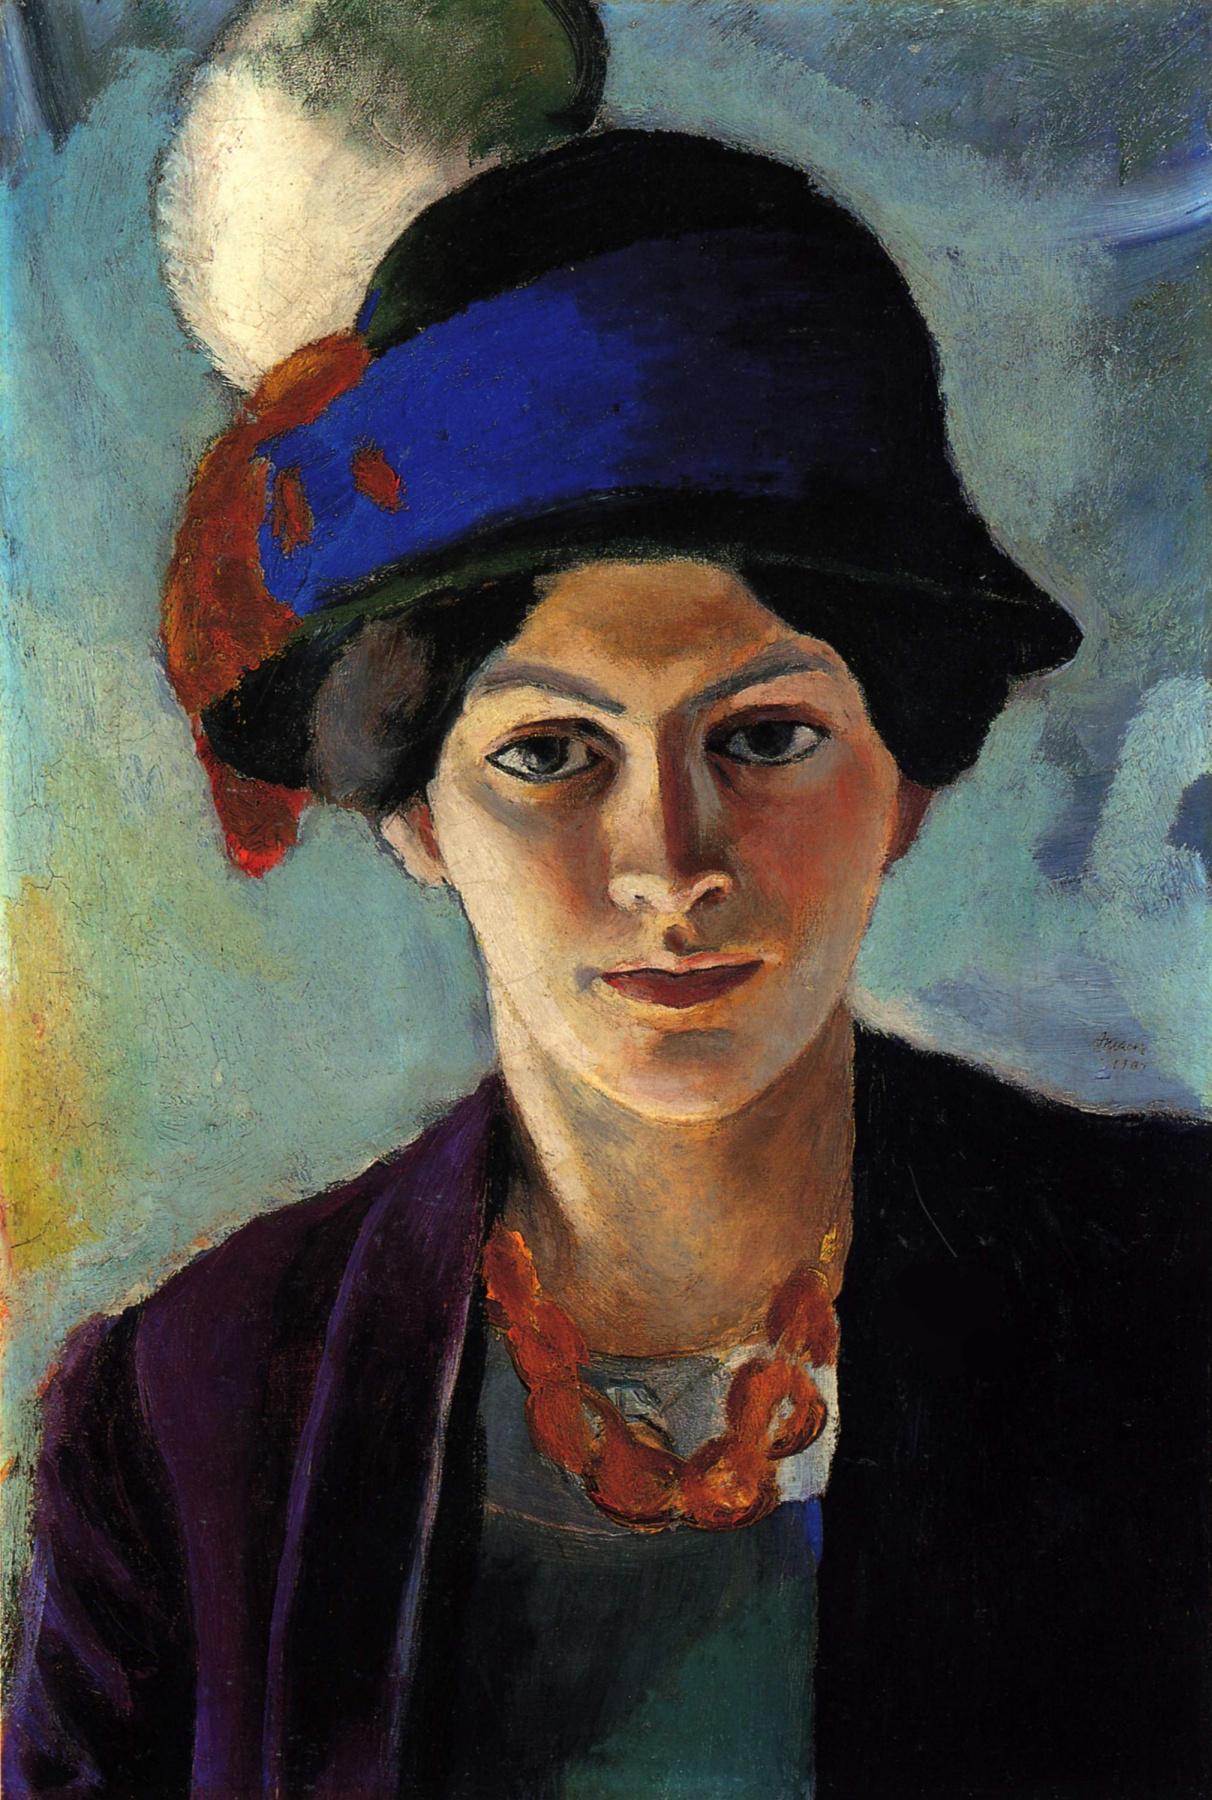 August Macke. Portrait of the artist's wife in a hat